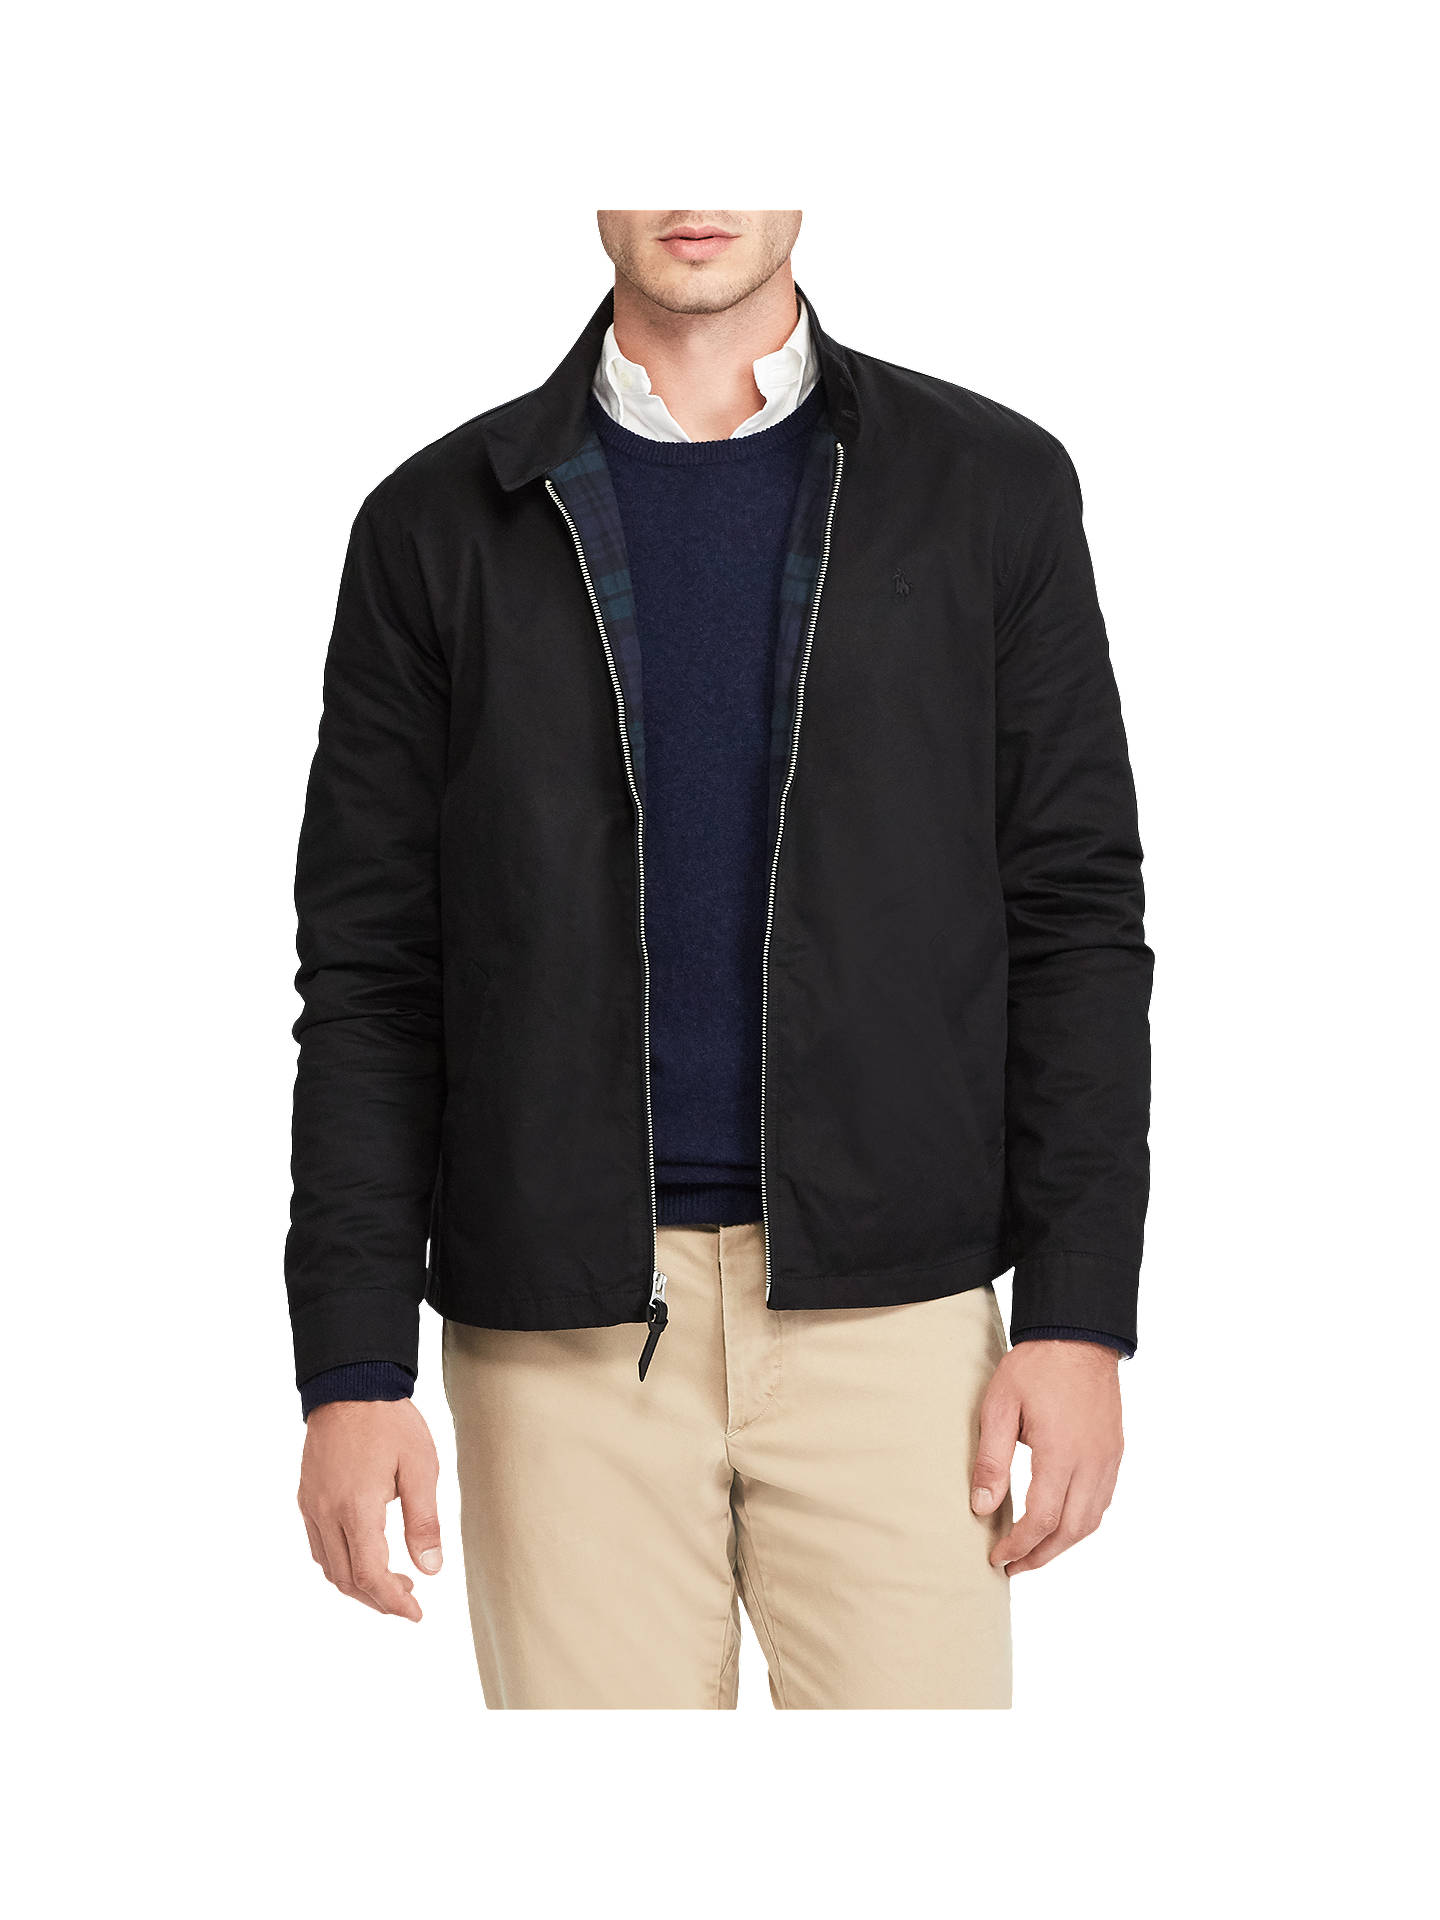 37f73d363d41 Buy Polo Ralph Lauren Barracuda Lined Jacket